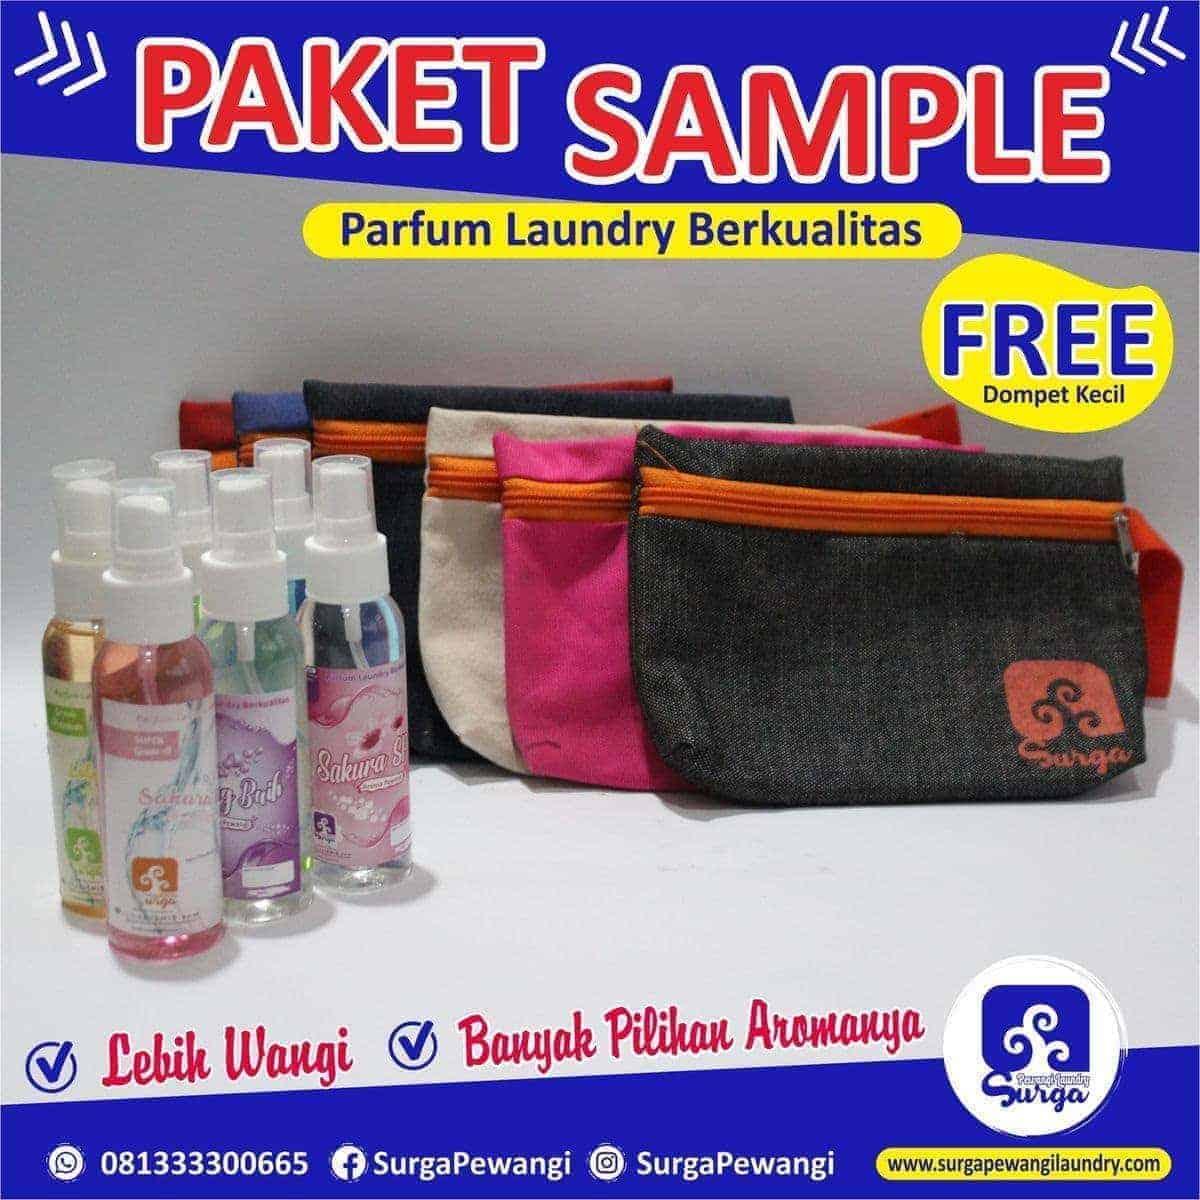 paket sample surga pewangi laundry 1200x1200 - AROMA PARFUM LAUNDRY TERLARIS PALING WANGI TERBARU 2020